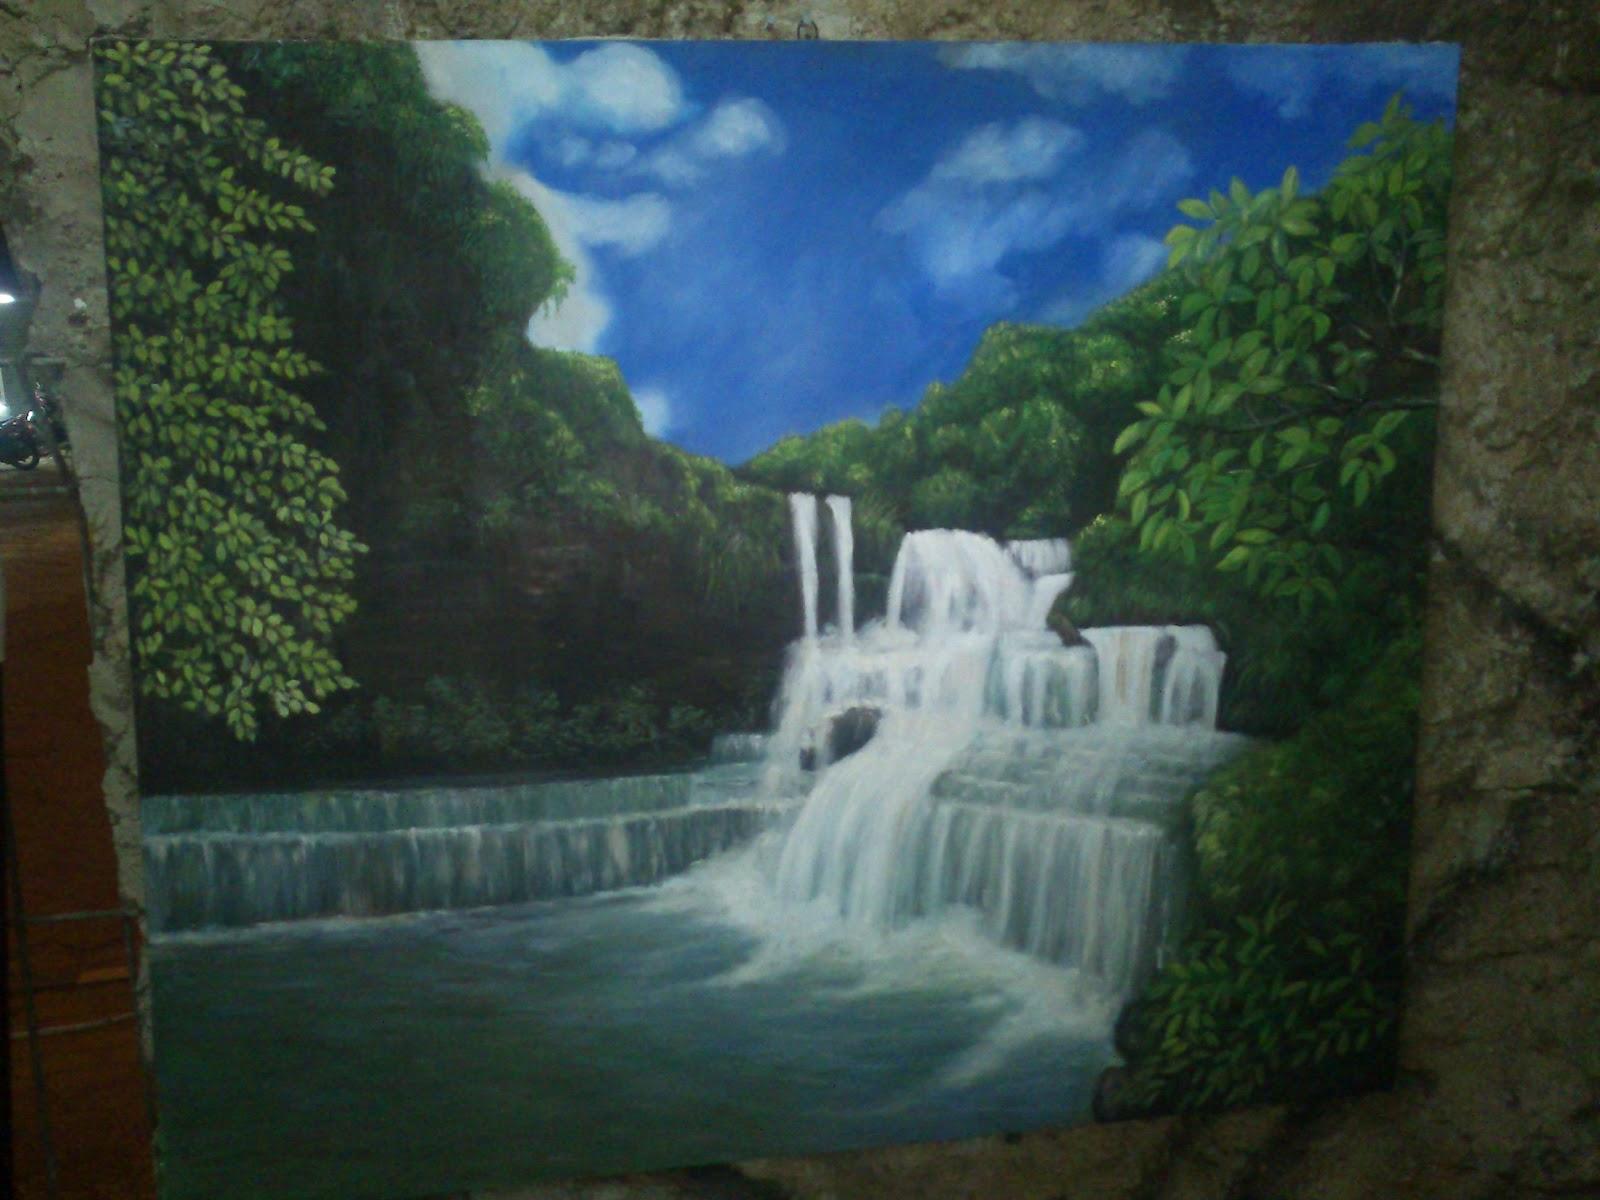 Nita Frame Lukisan Pemandangan Air Terjun